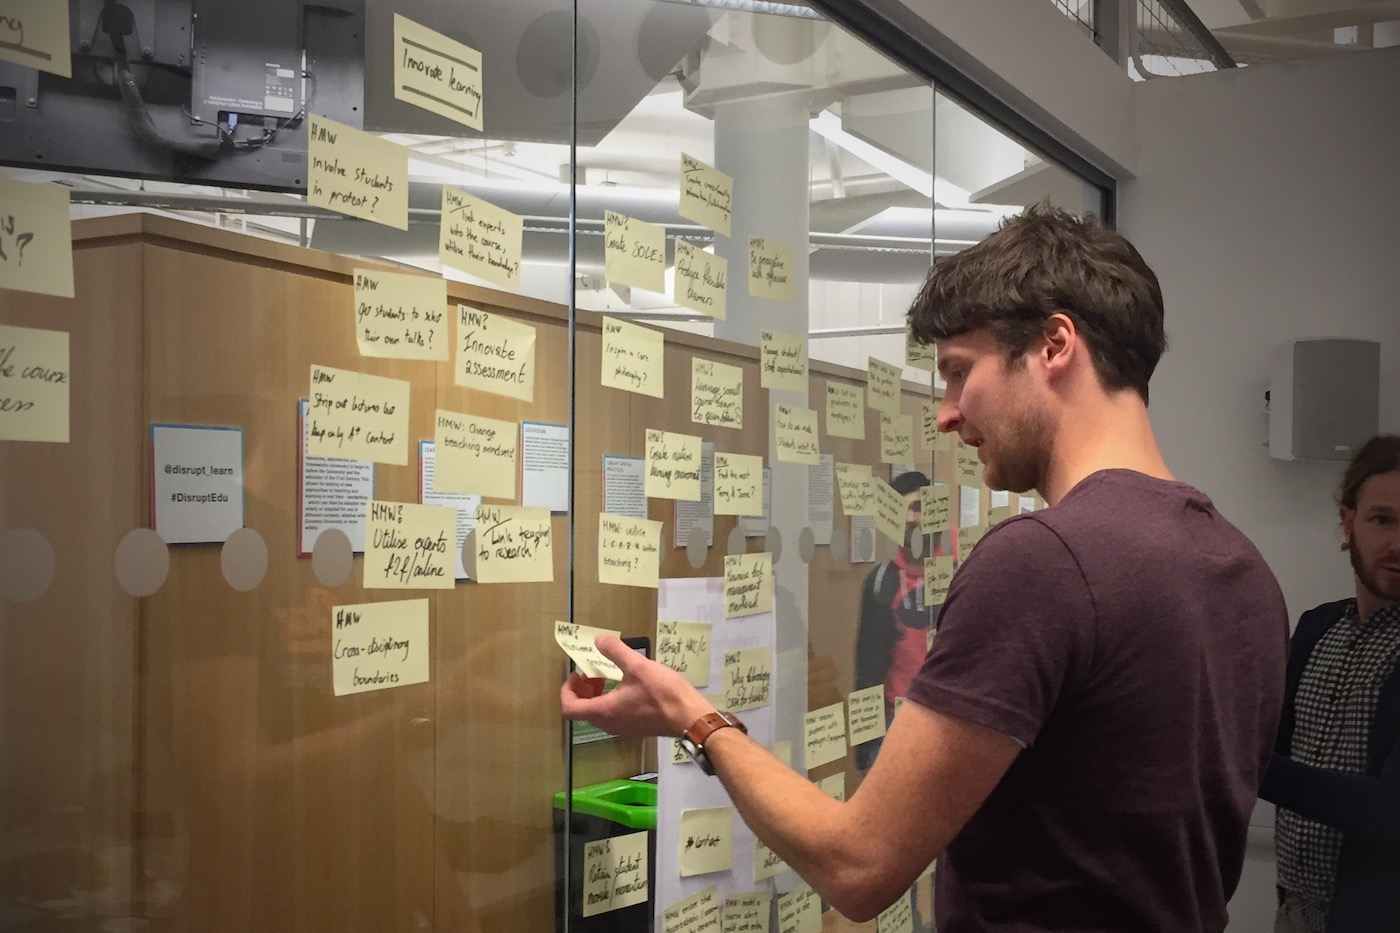 dmll-project-room-activity